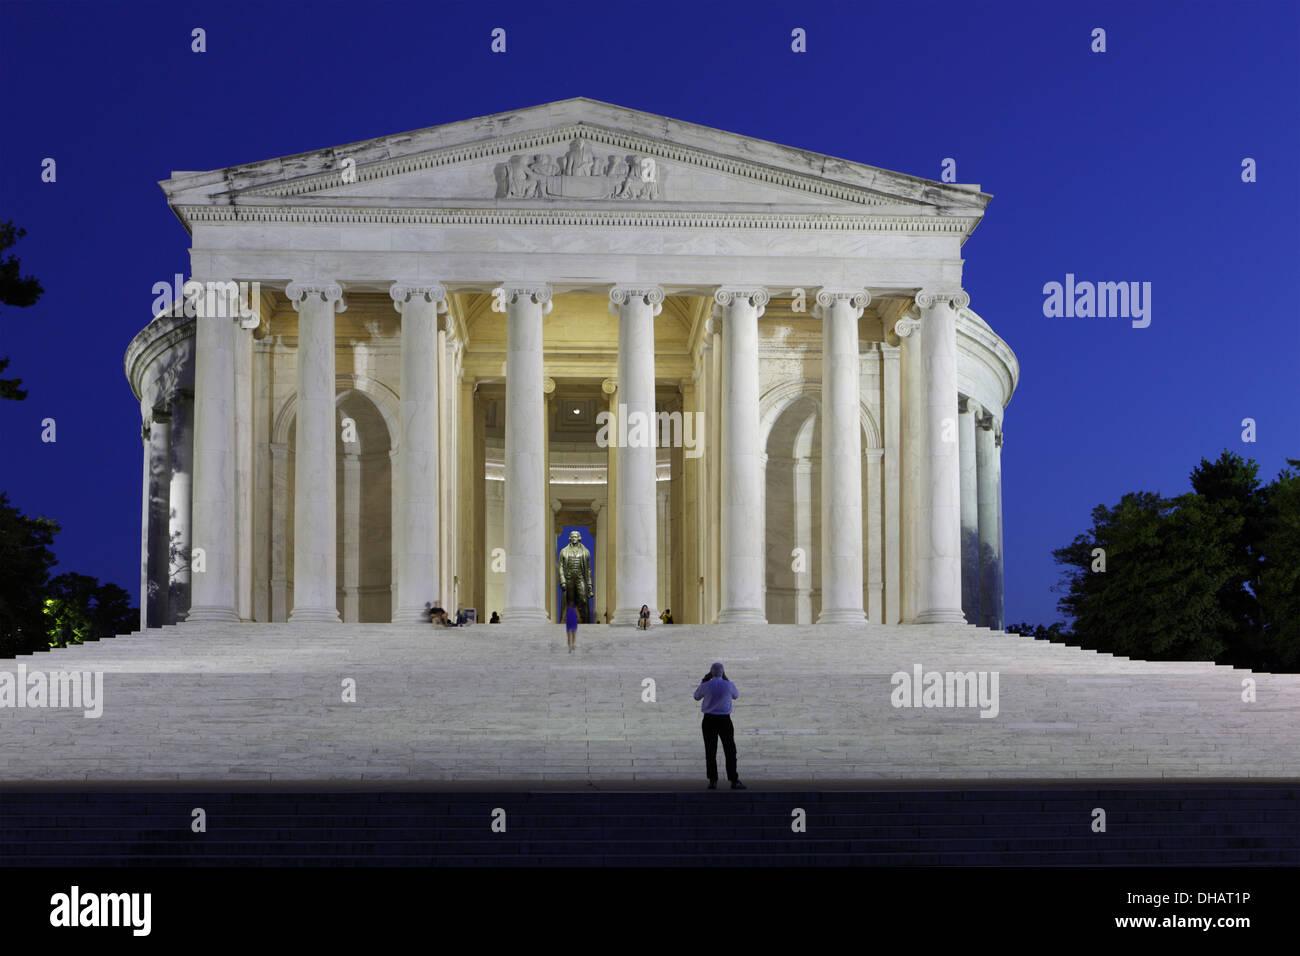 Thomas Jefferson Memorial, Washington D.C.,USA - Stock Image